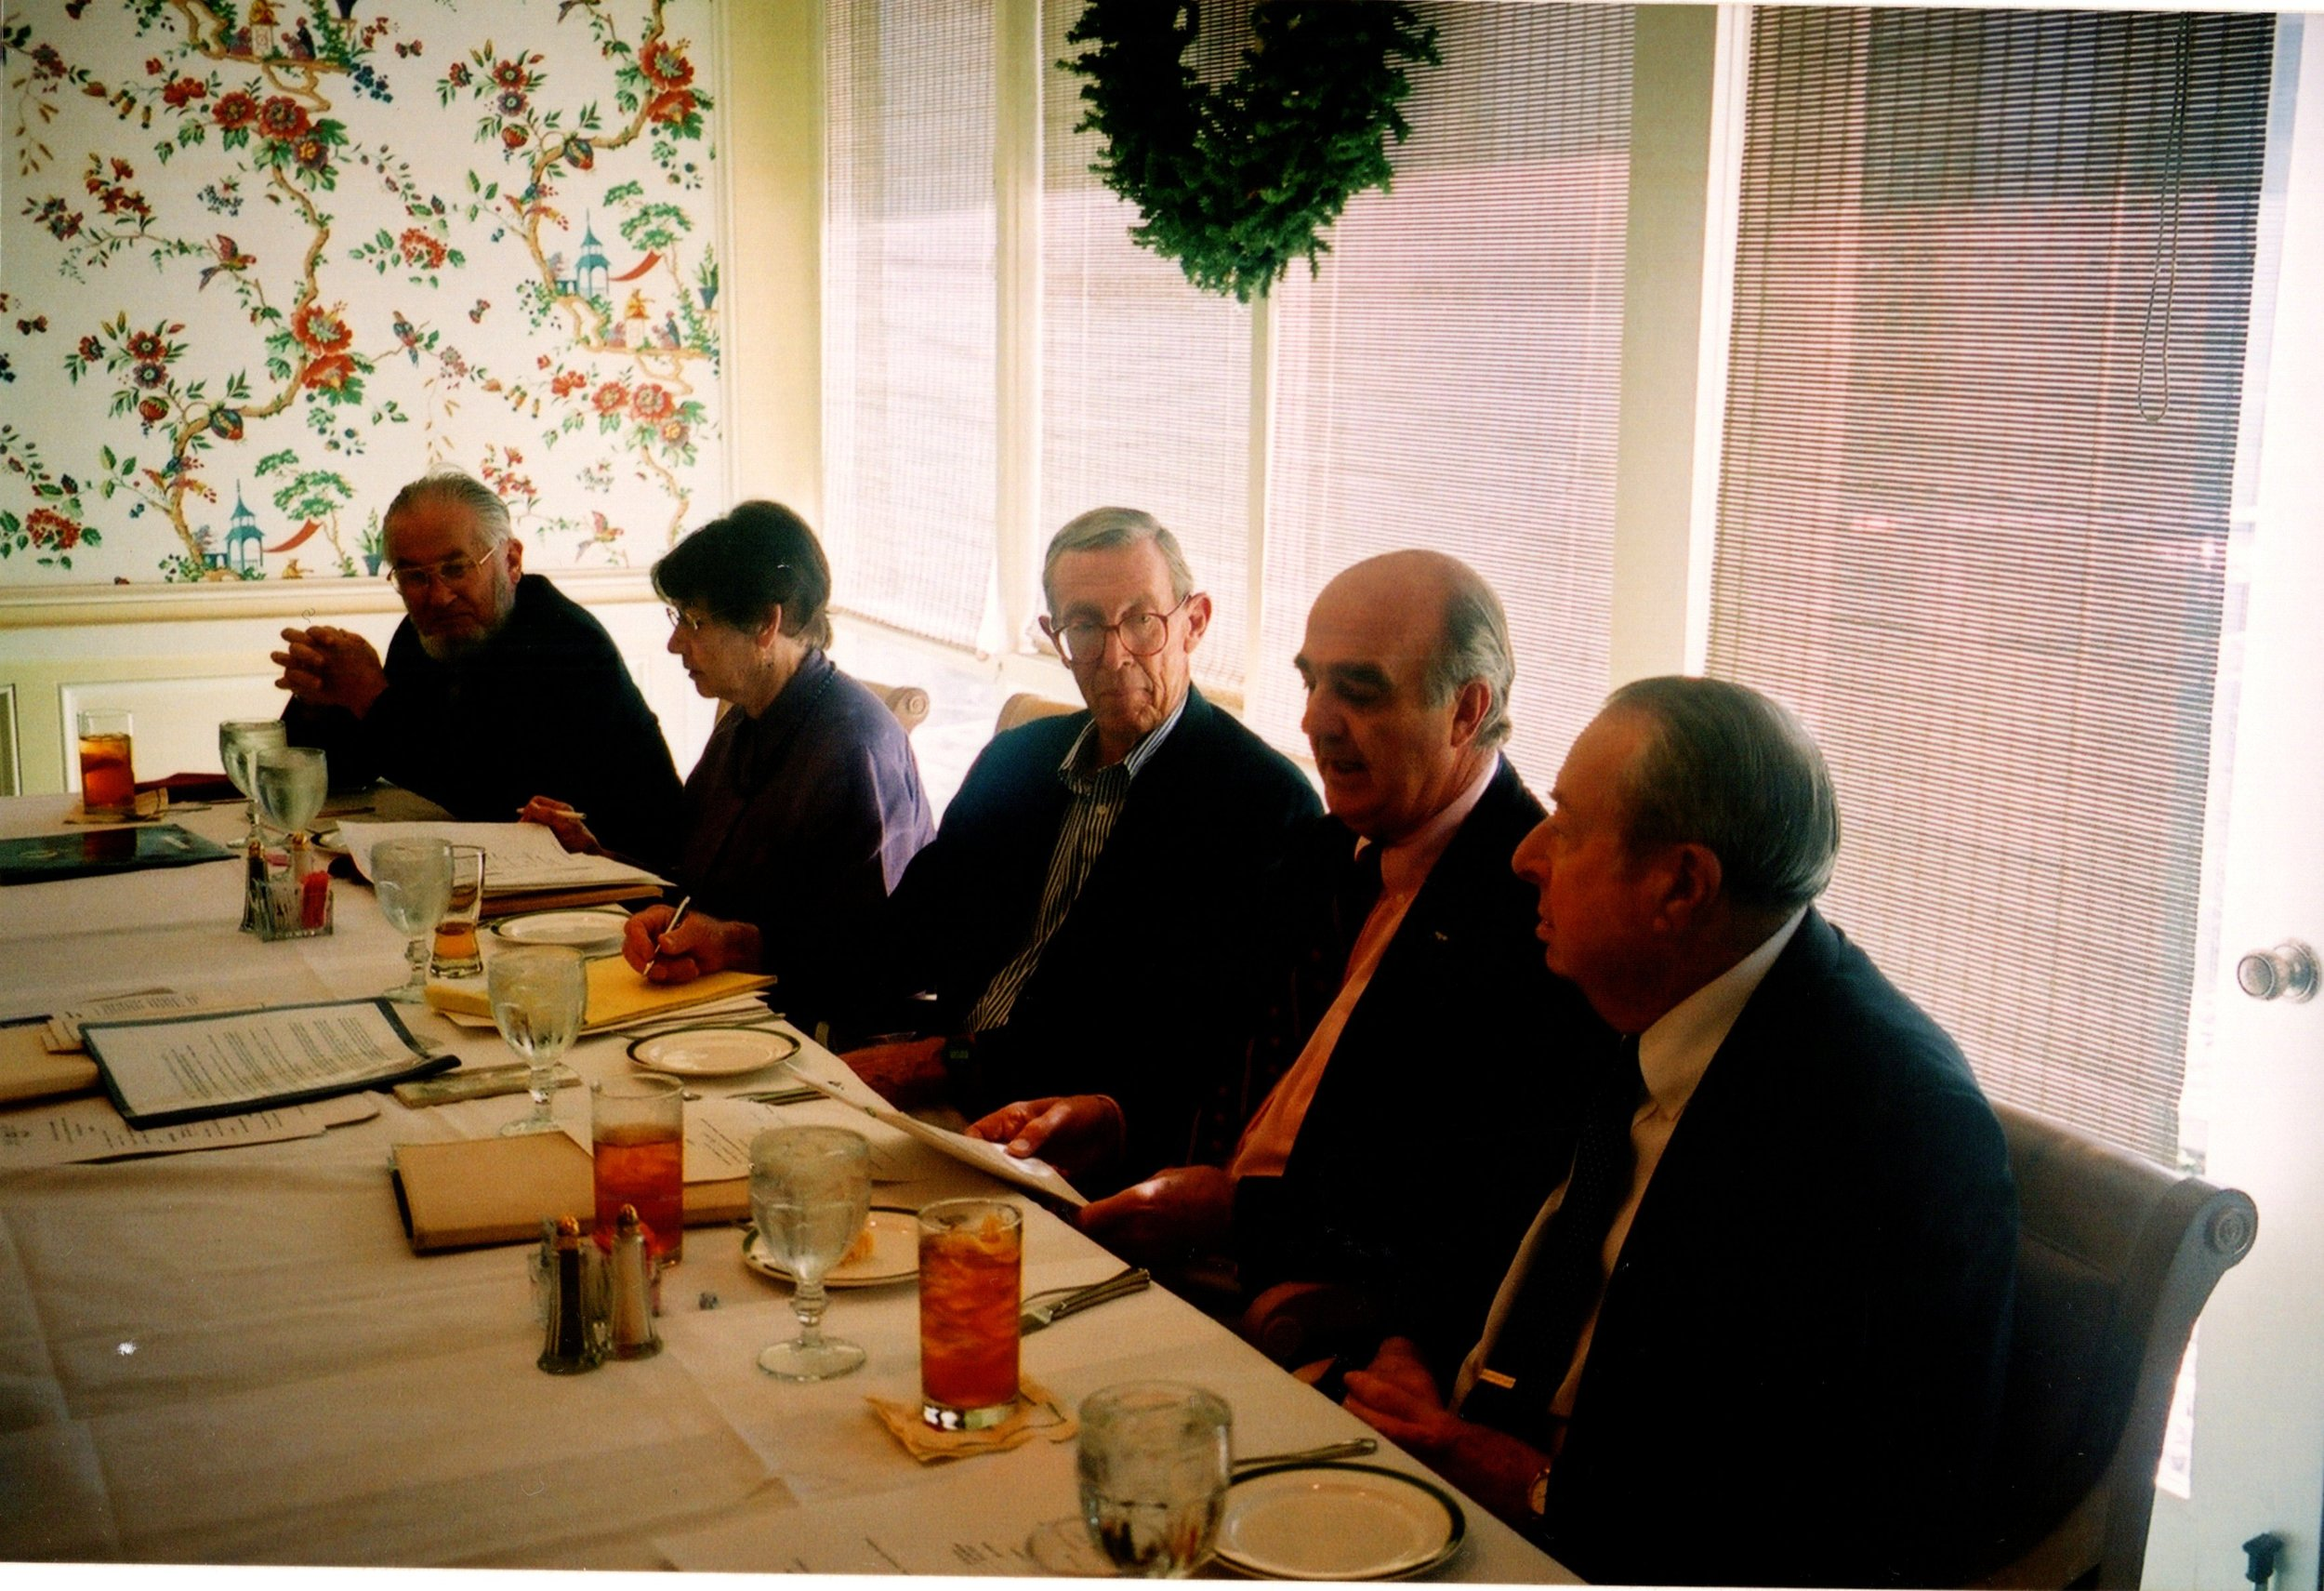 1_15_2000 - ANNUAL MEETING OF MEMBERS - ROYAL POINCIANA GOLF CLUB2.jpg